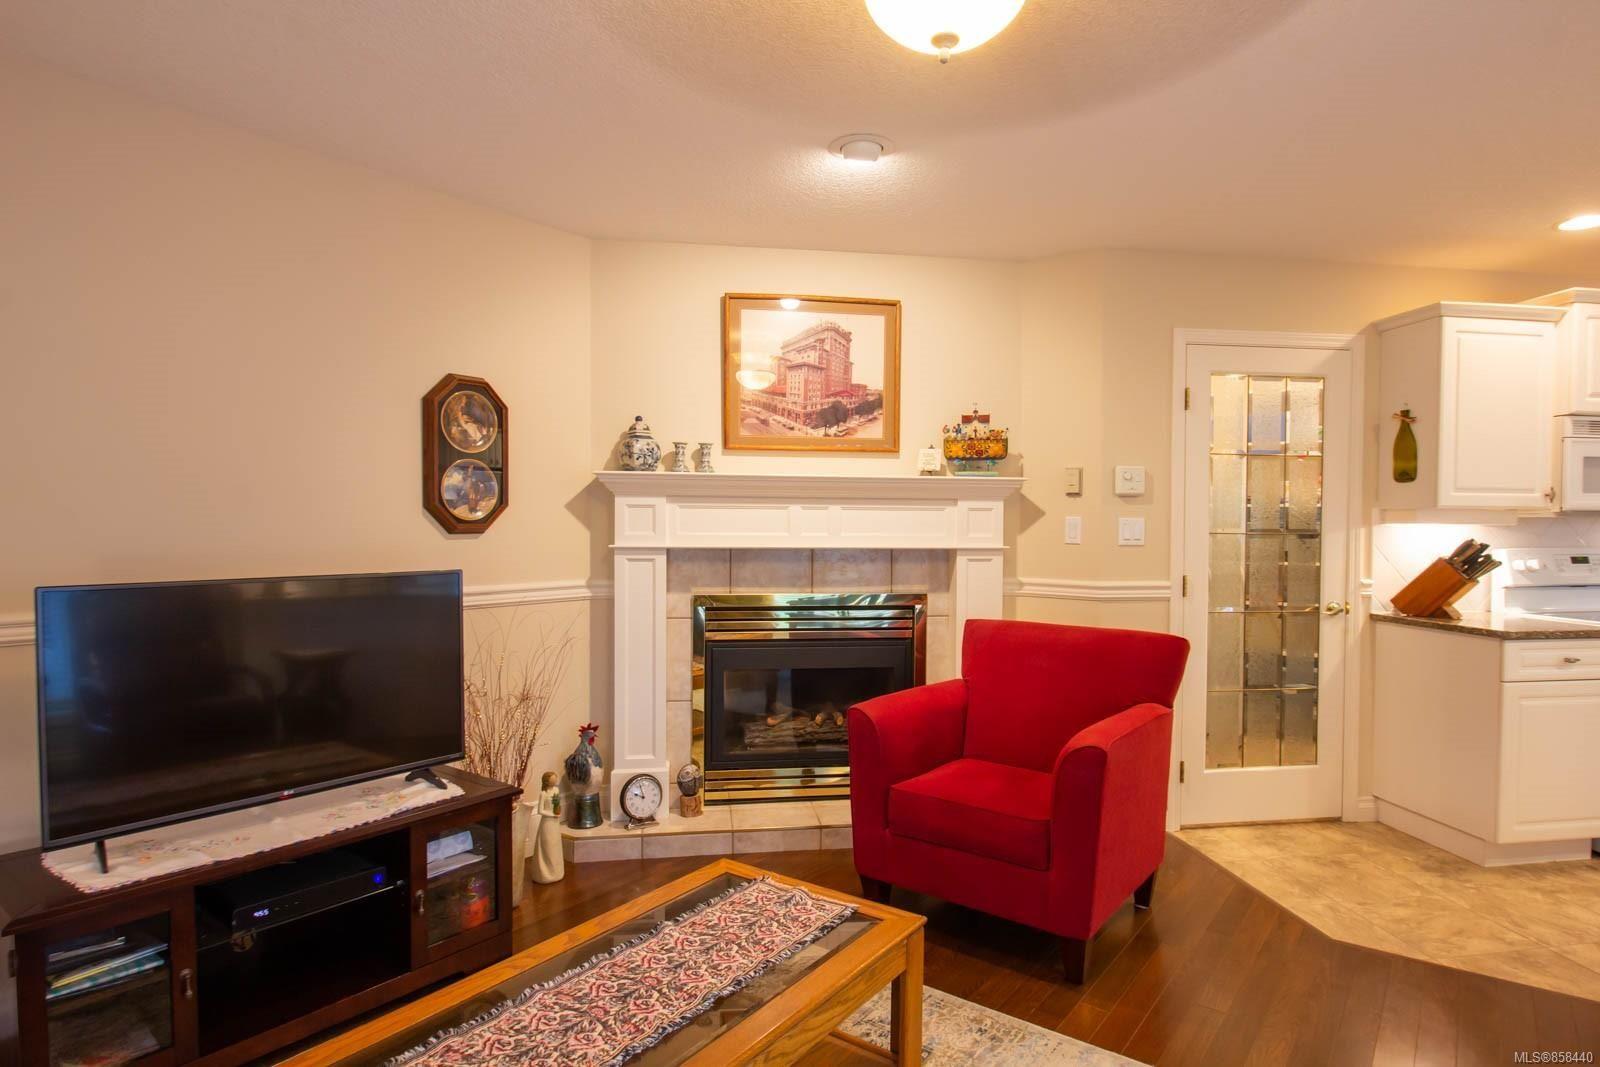 Photo 6: Photos: 798 Devon Pl in : PQ Qualicum Beach House for sale (Parksville/Qualicum)  : MLS®# 858440